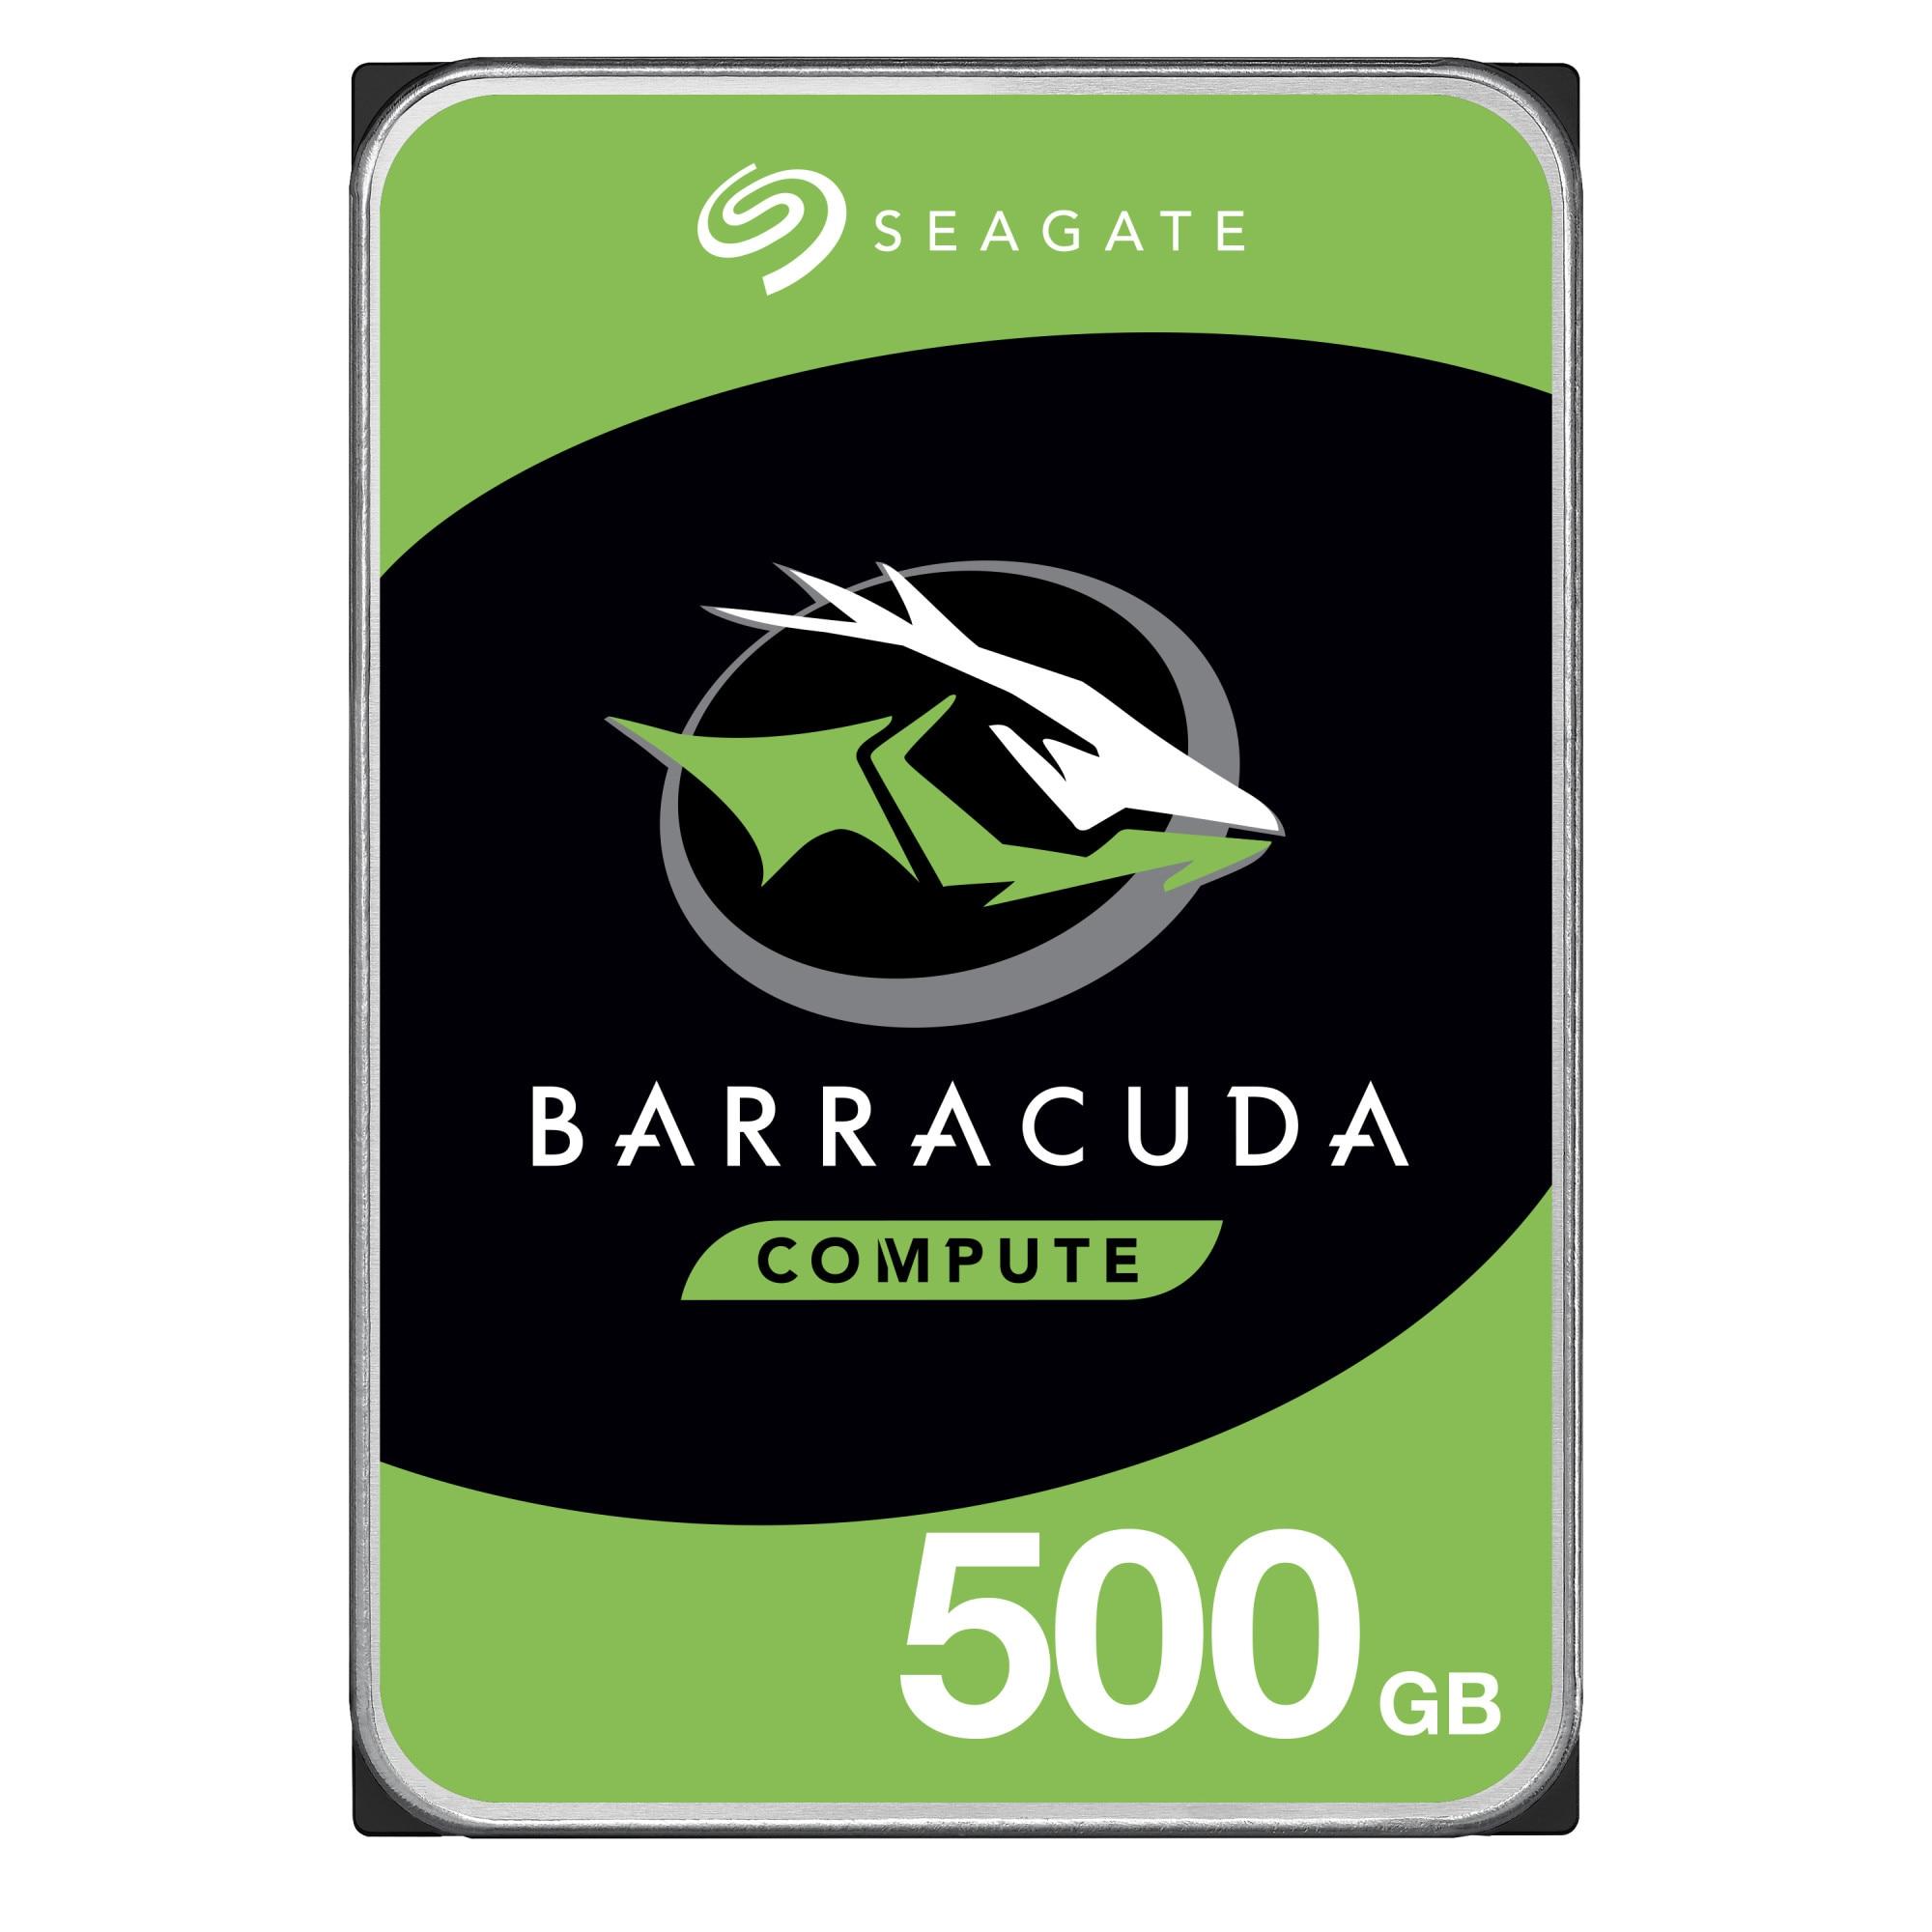 Fotografie Hard Disk Laptop Seagate Barracuda, 500GB, 5400 rpm, 2,5' SATA III